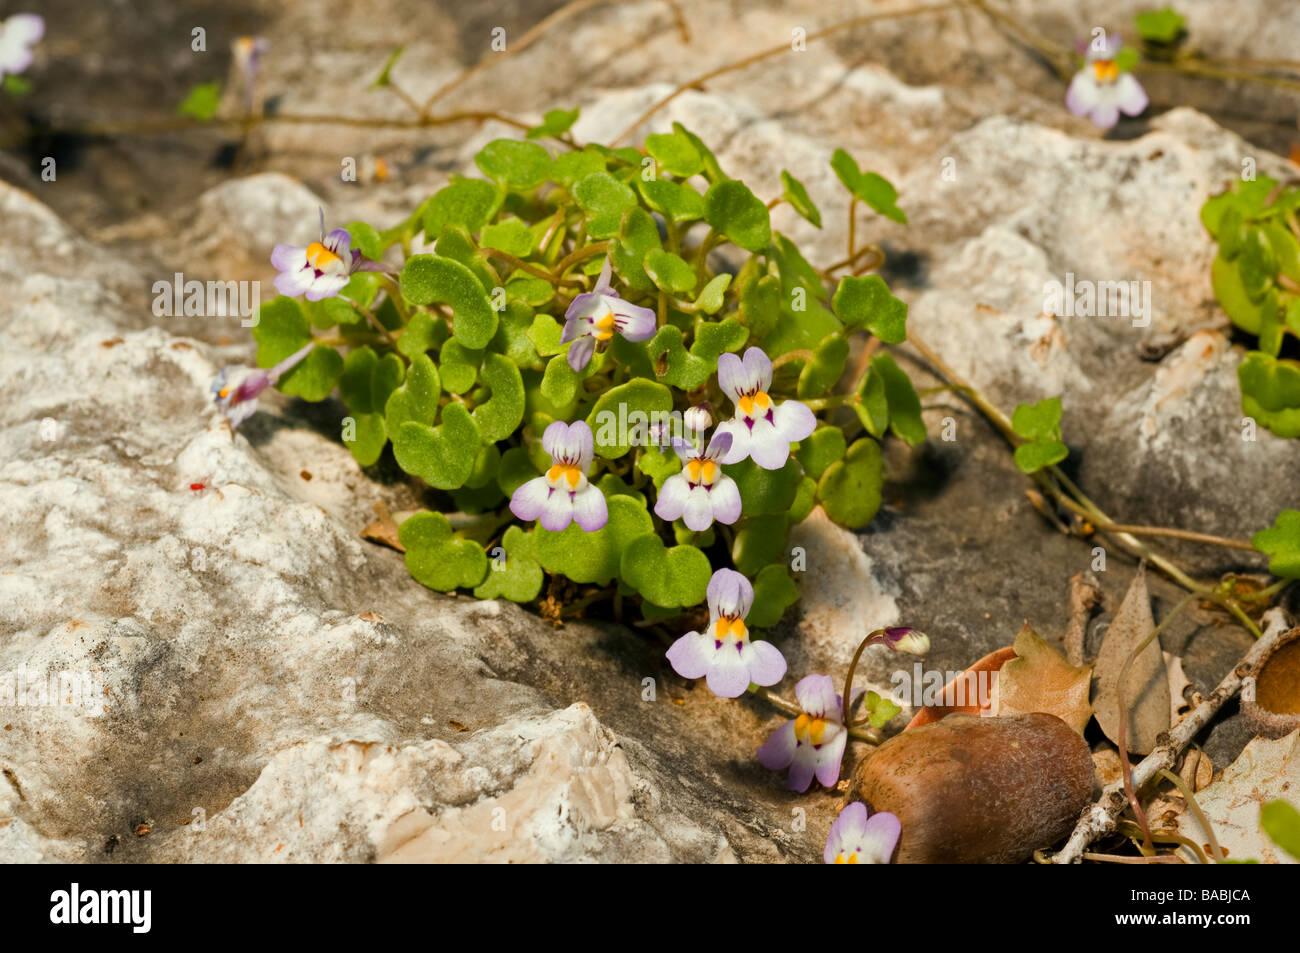 Ivy leaved toad-flax, Cymbalaria microcalyx, Kas Antalya Turkey April 2009 - Stock Image